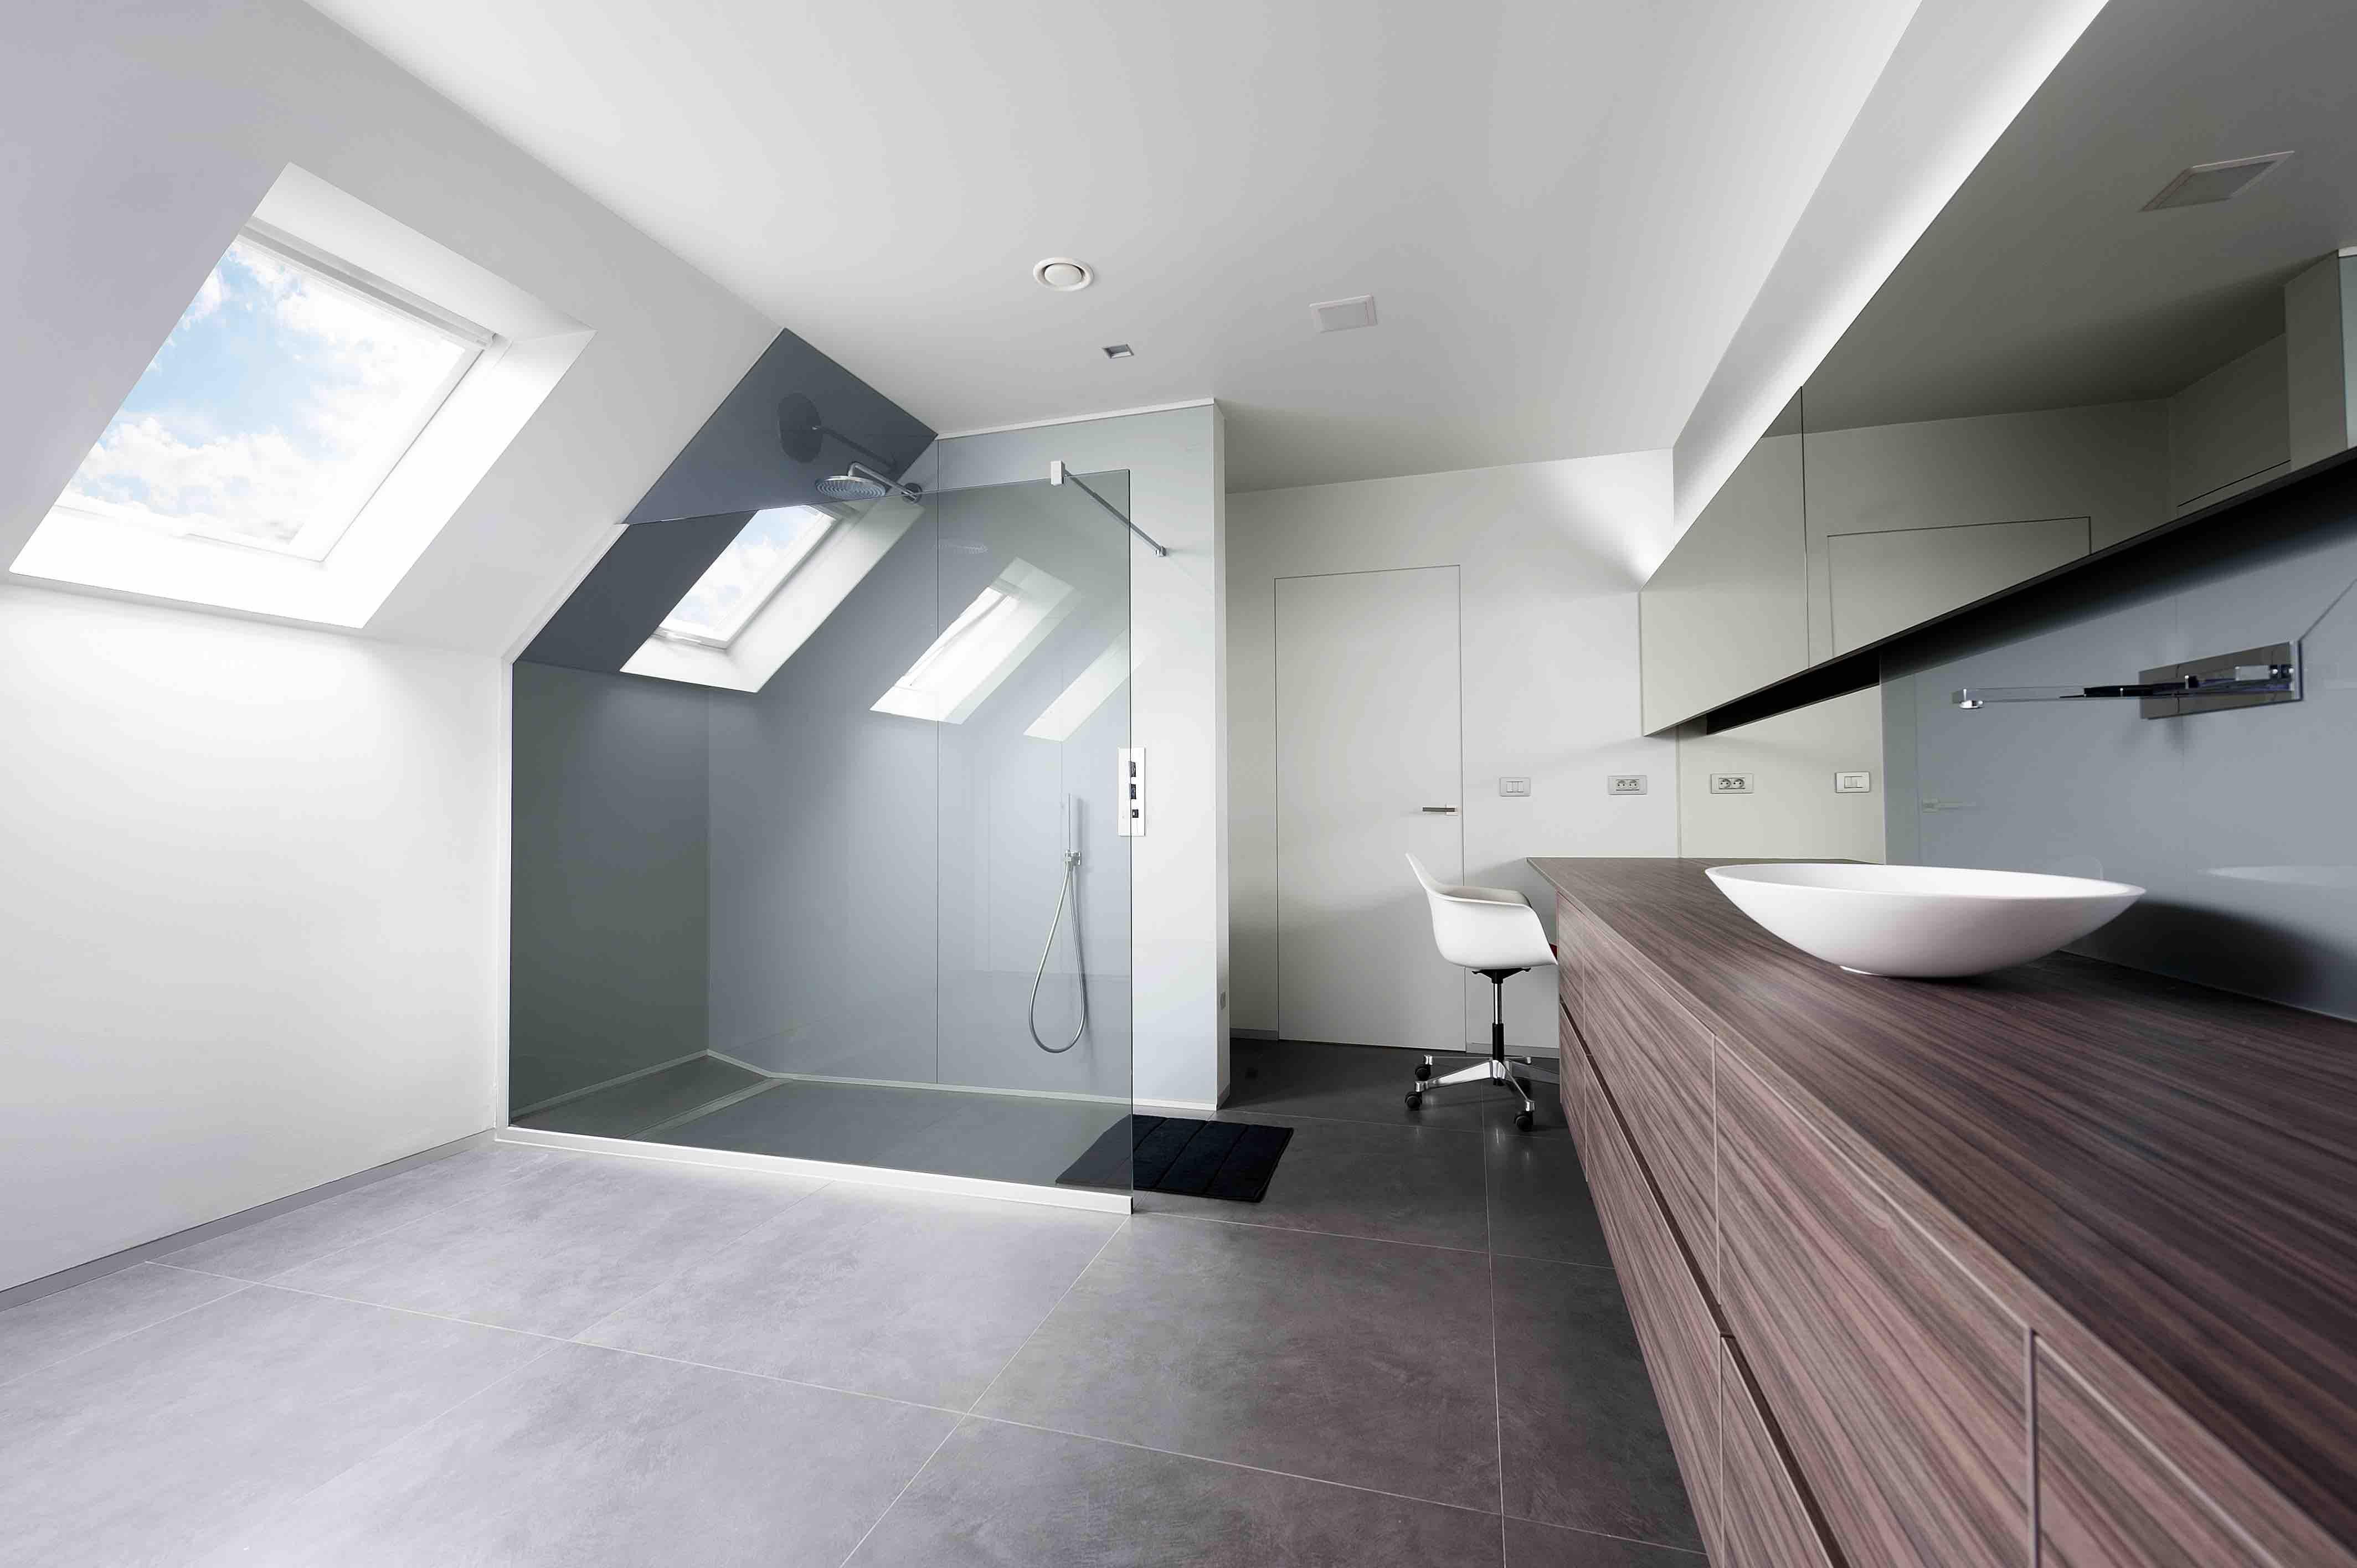 Douchewand en spiegels onder dak01